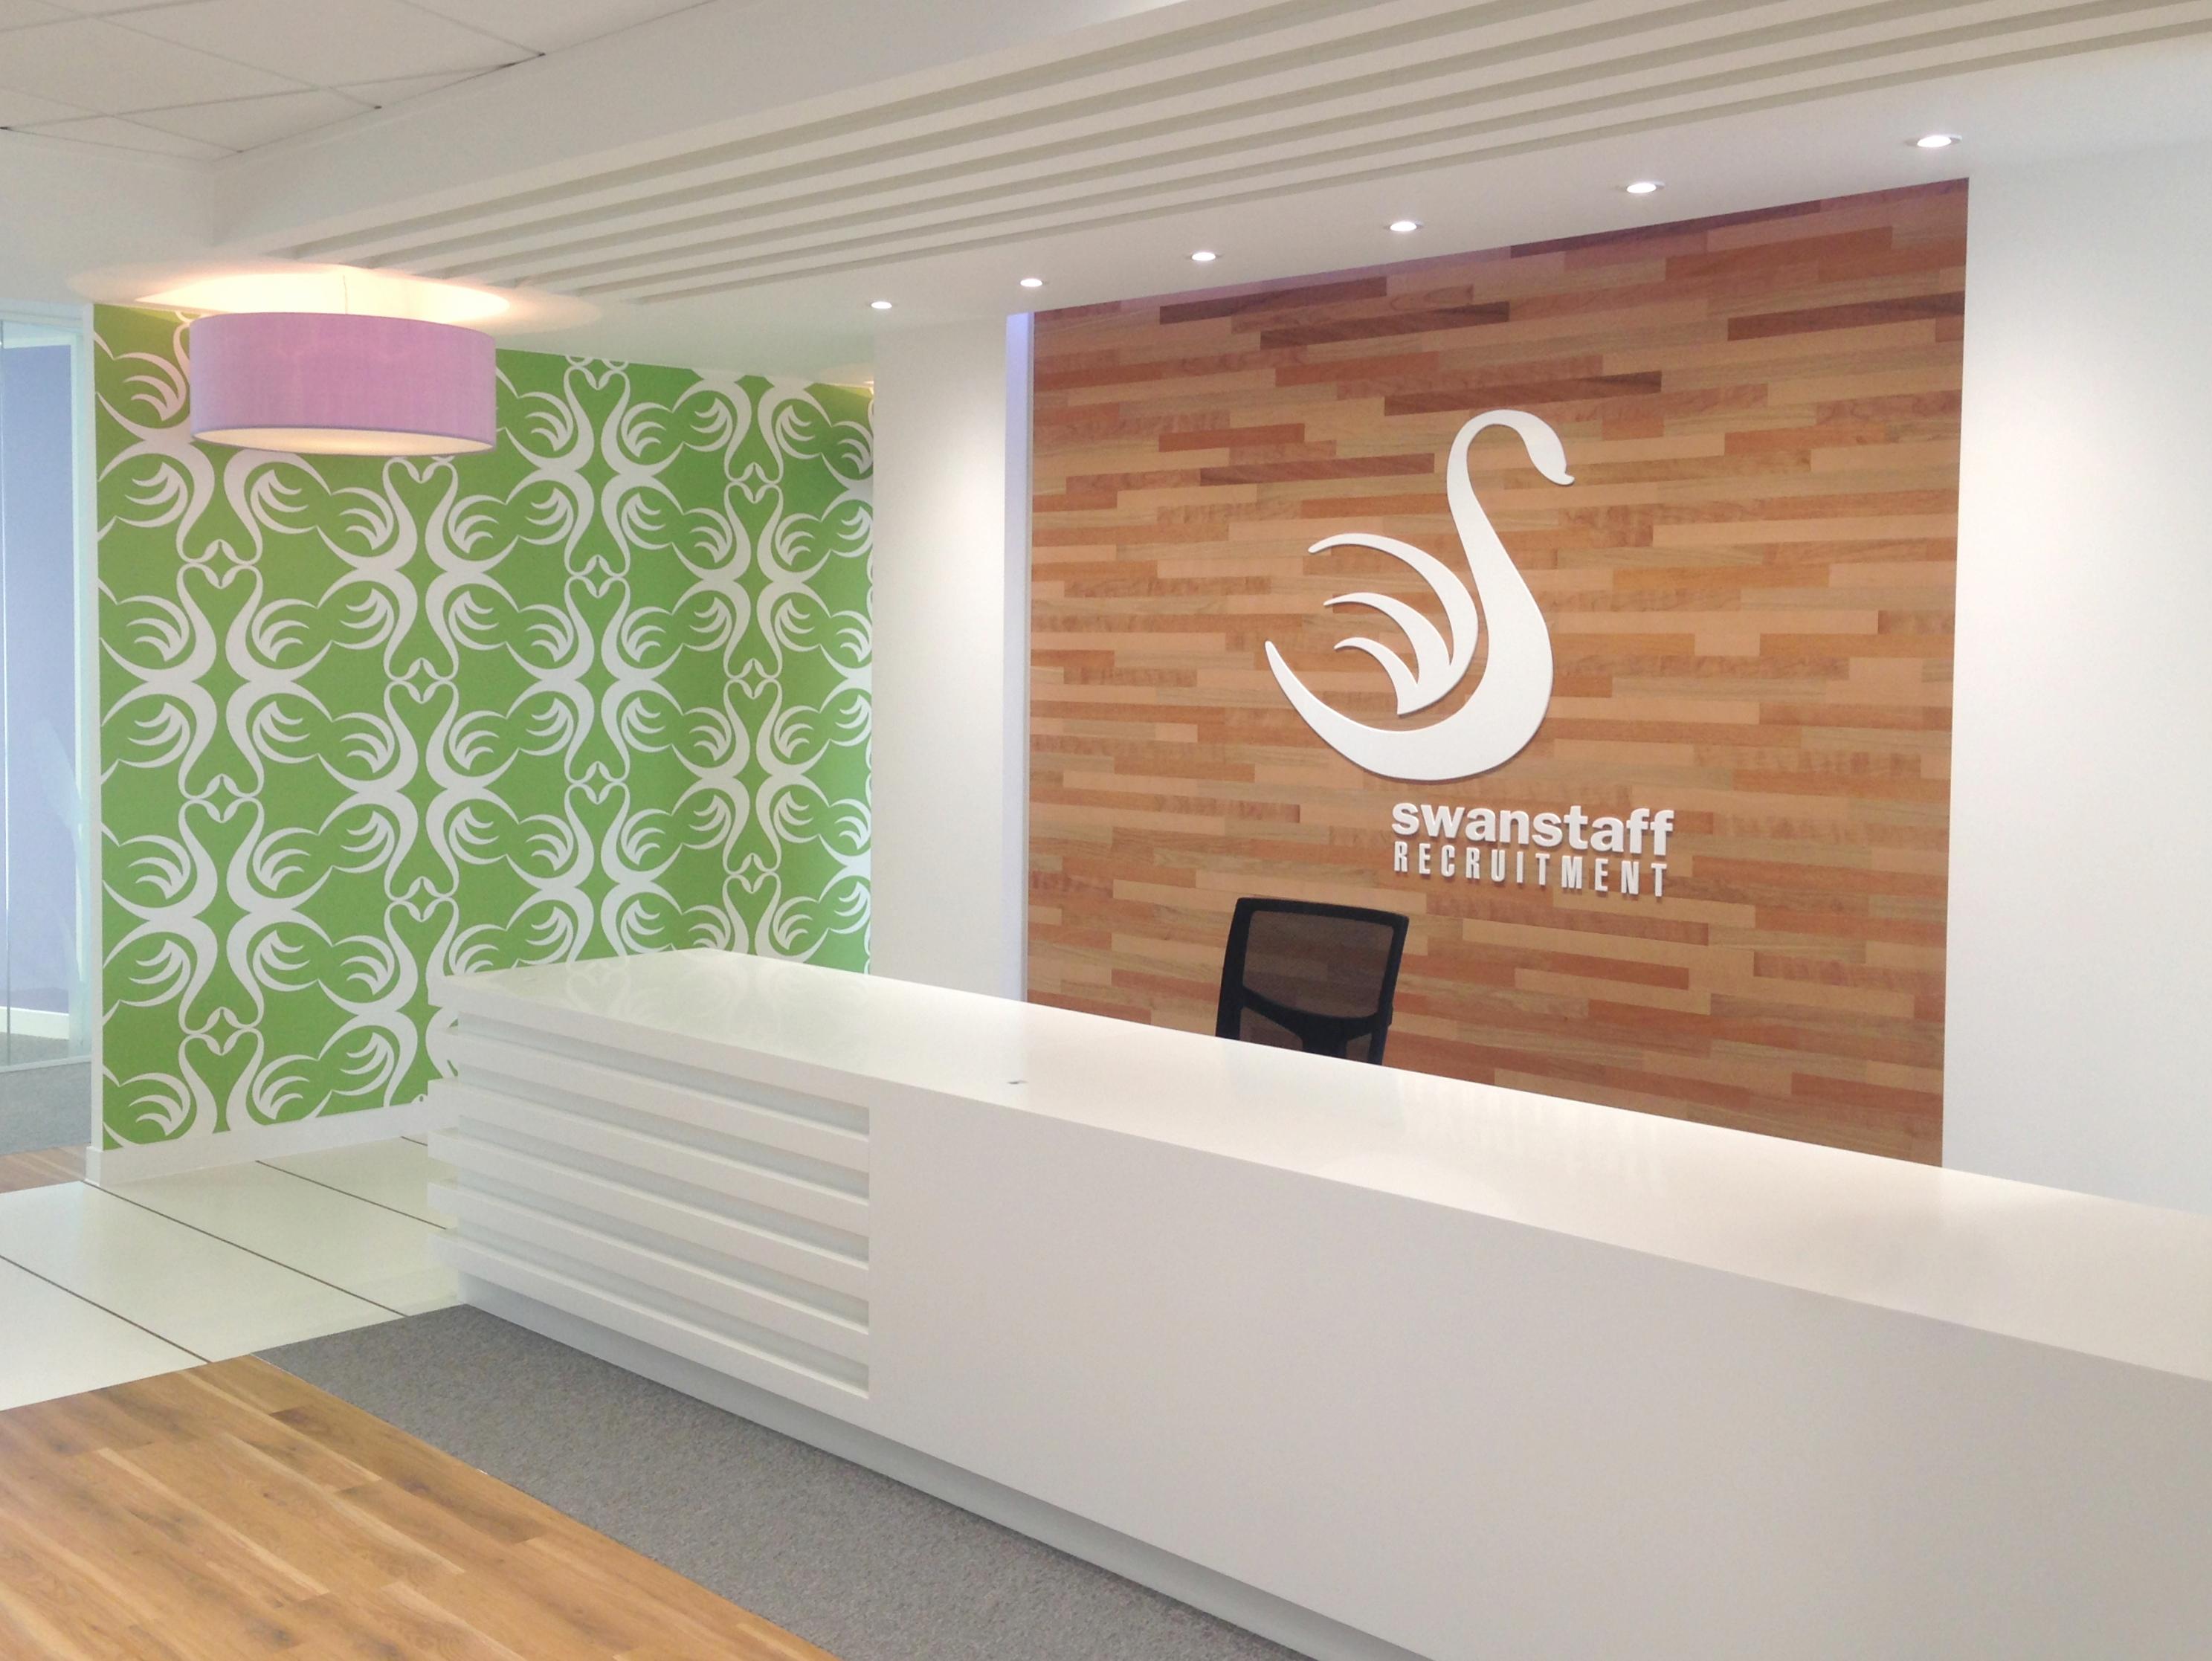 Swanstaff Recruitment bespoke furniture